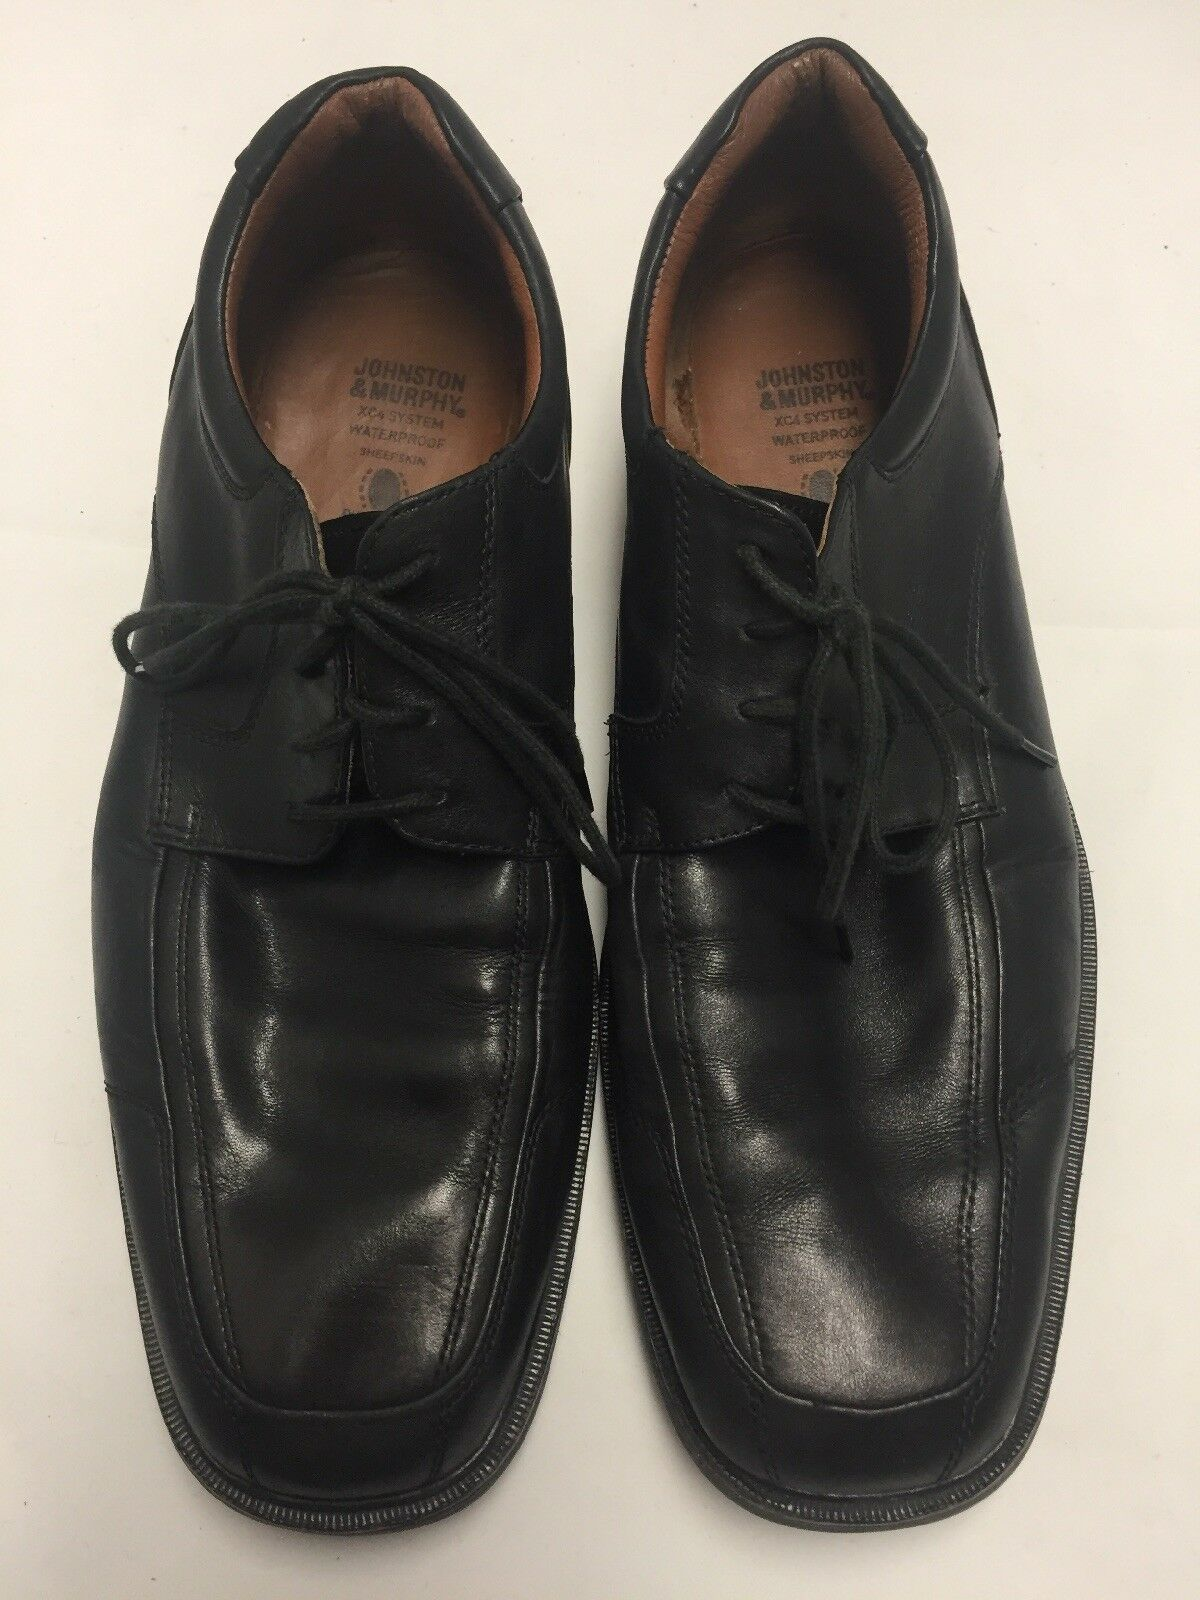 Johnston Murphy XC4 Oxford Waterproof Mens Black Sheepskin Leather Shoes Sz 11M